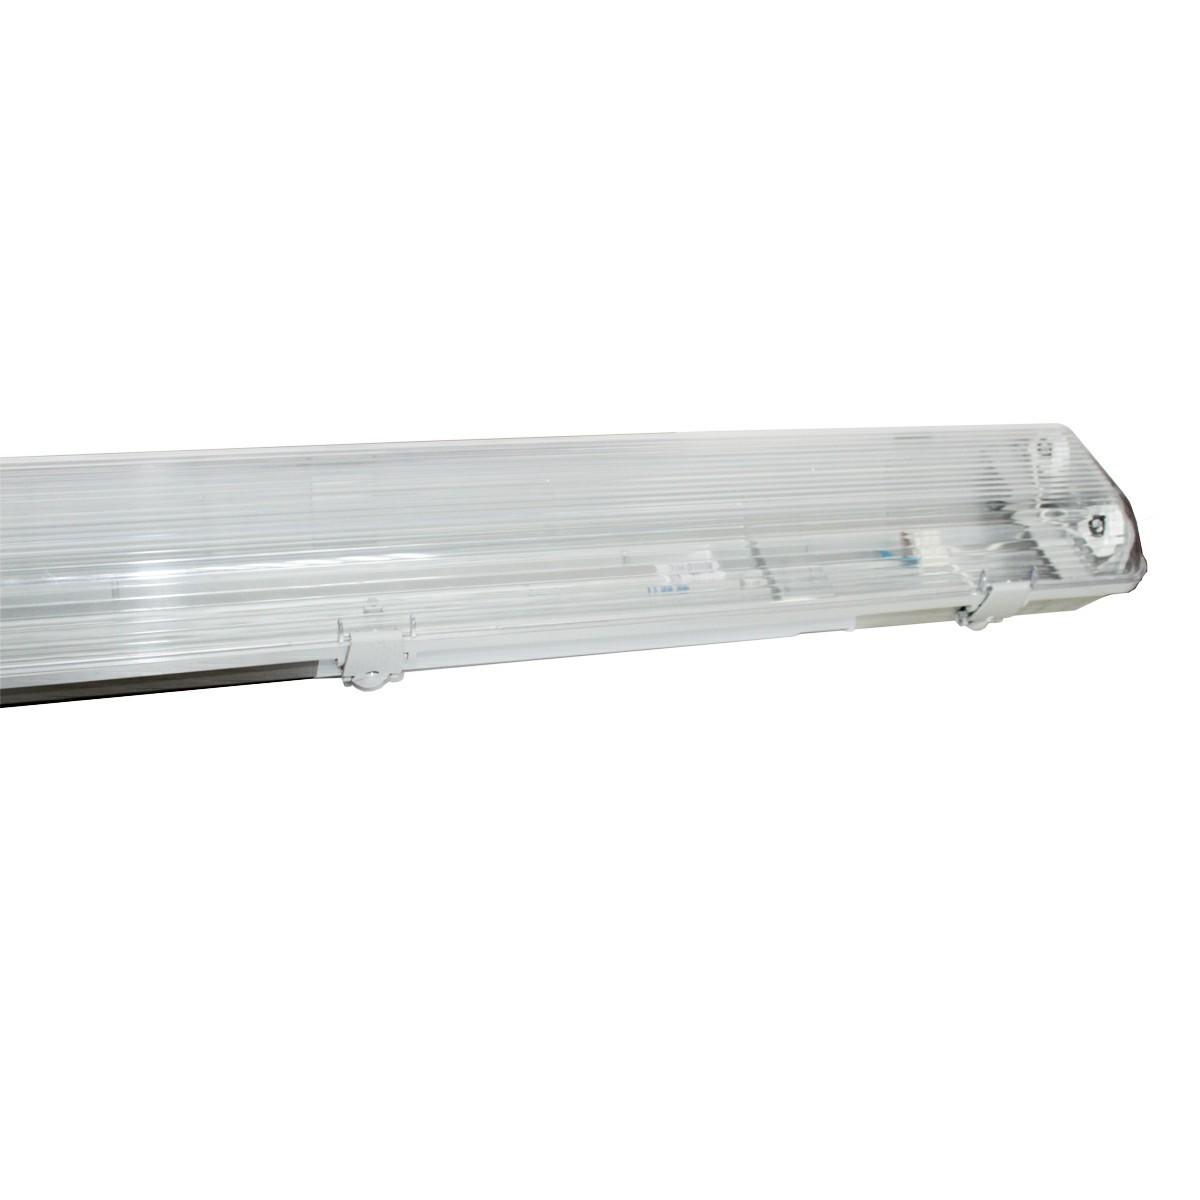 Lighting Fixture LED TUBE LZG2x18W 2(120sm)HG/